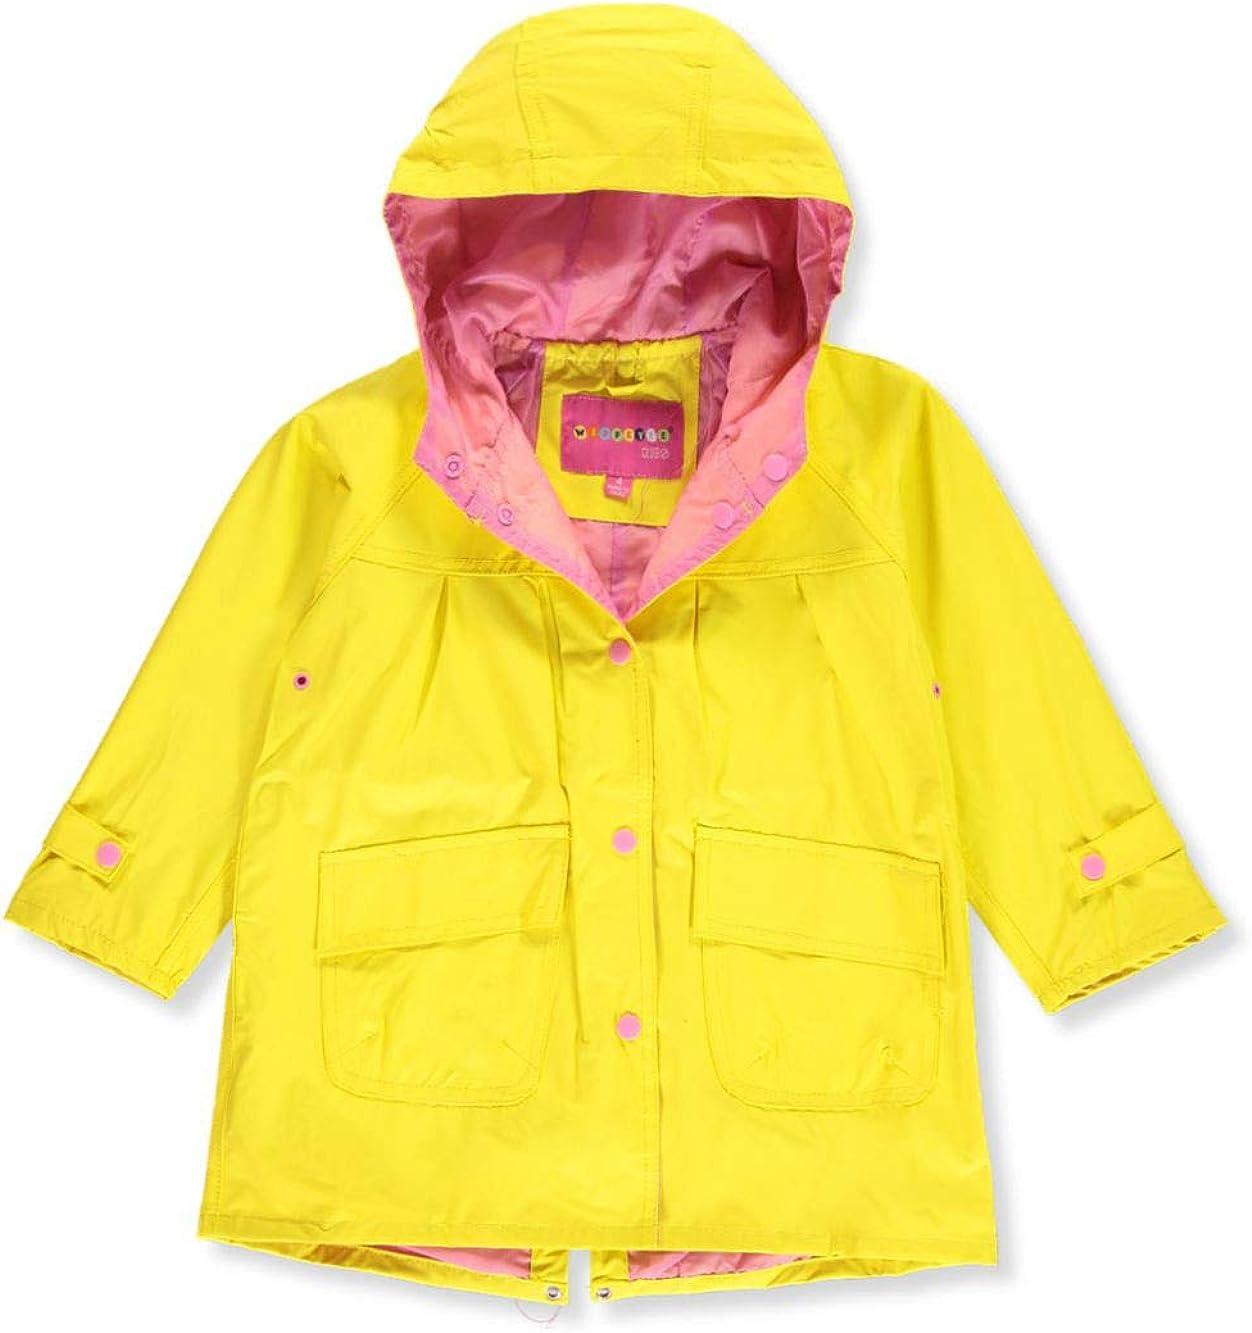 Wippette Unisex Raincoat